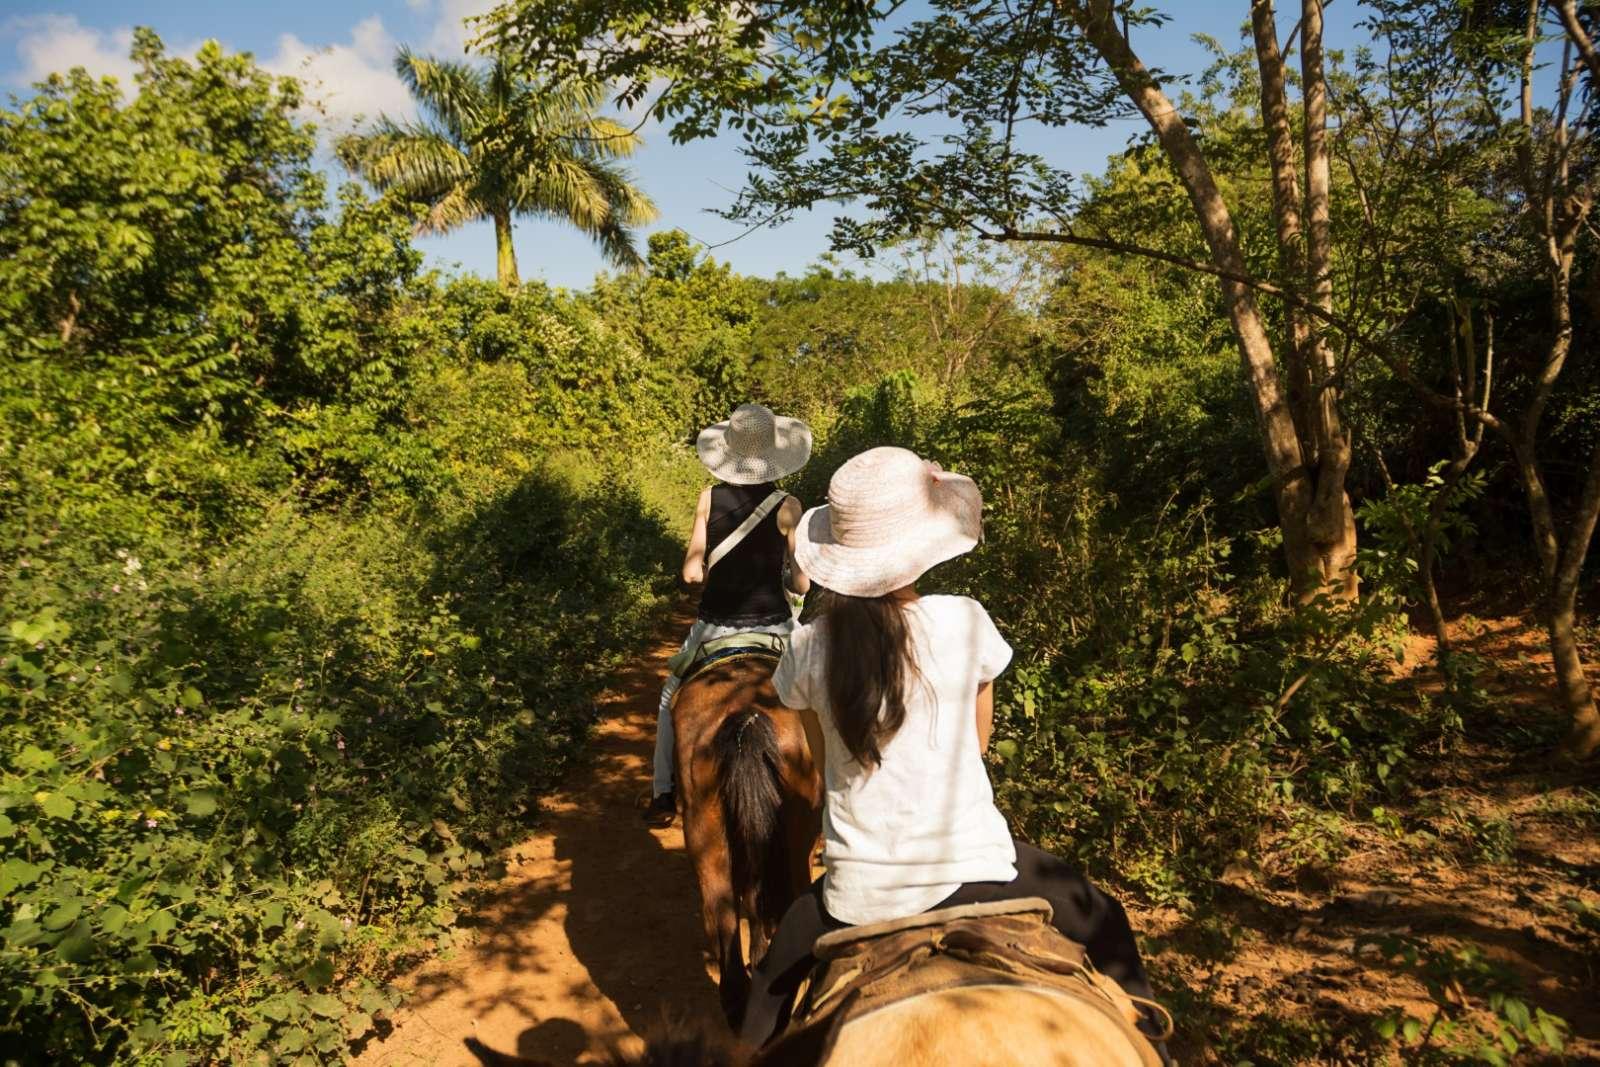 Horseback riding in Vinales, Cuba